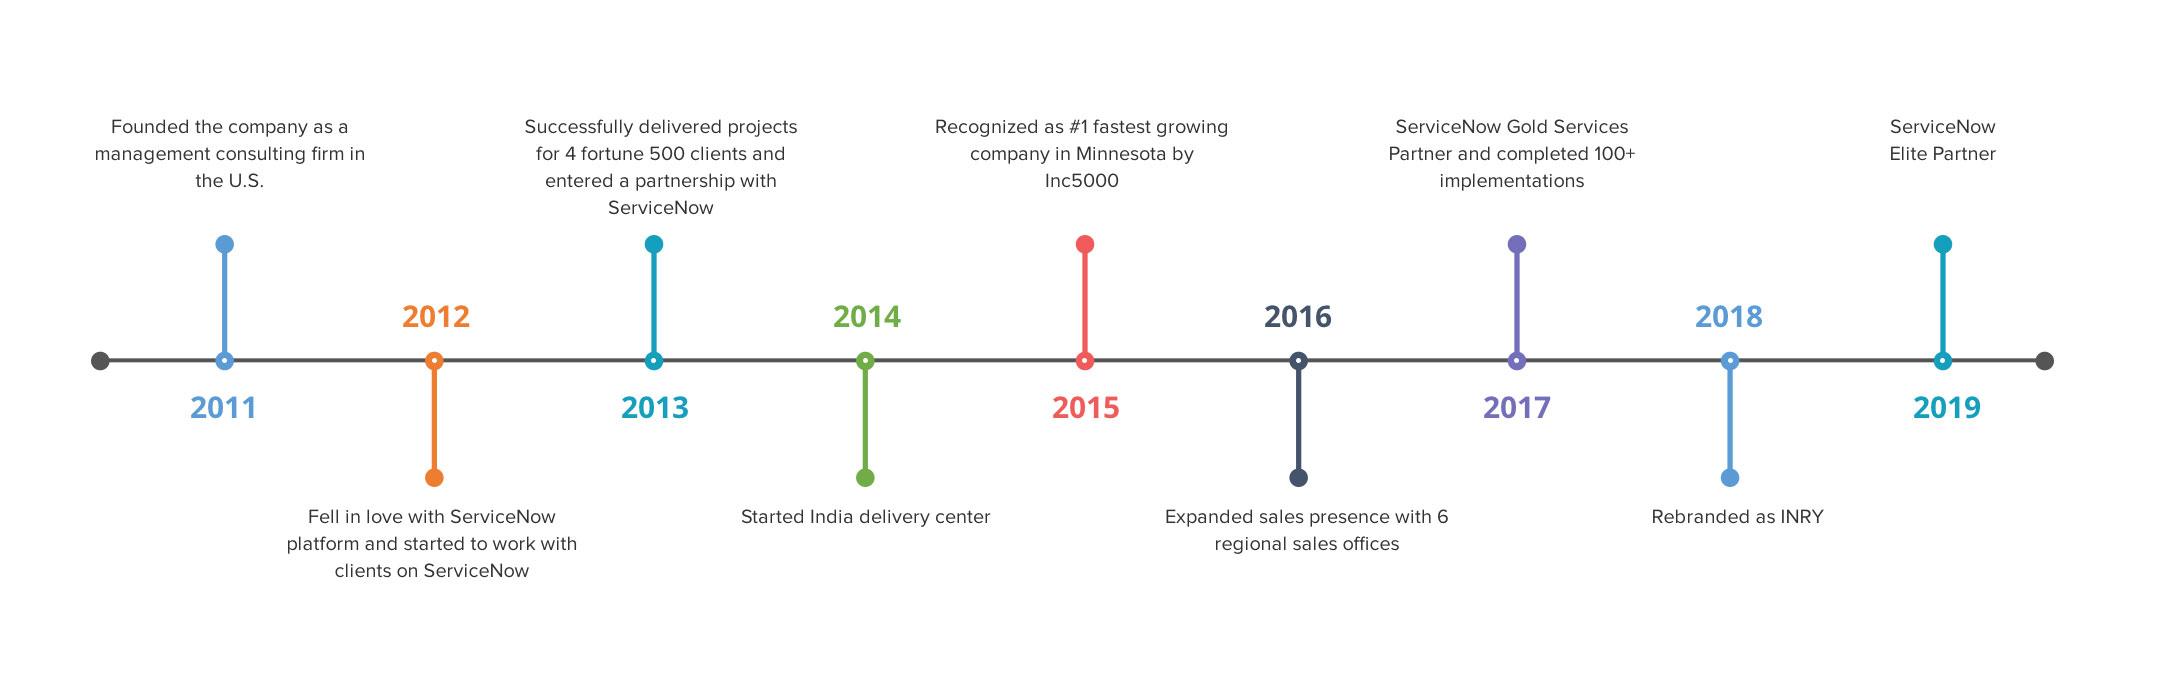 inry-servicenow-partnership-timeline